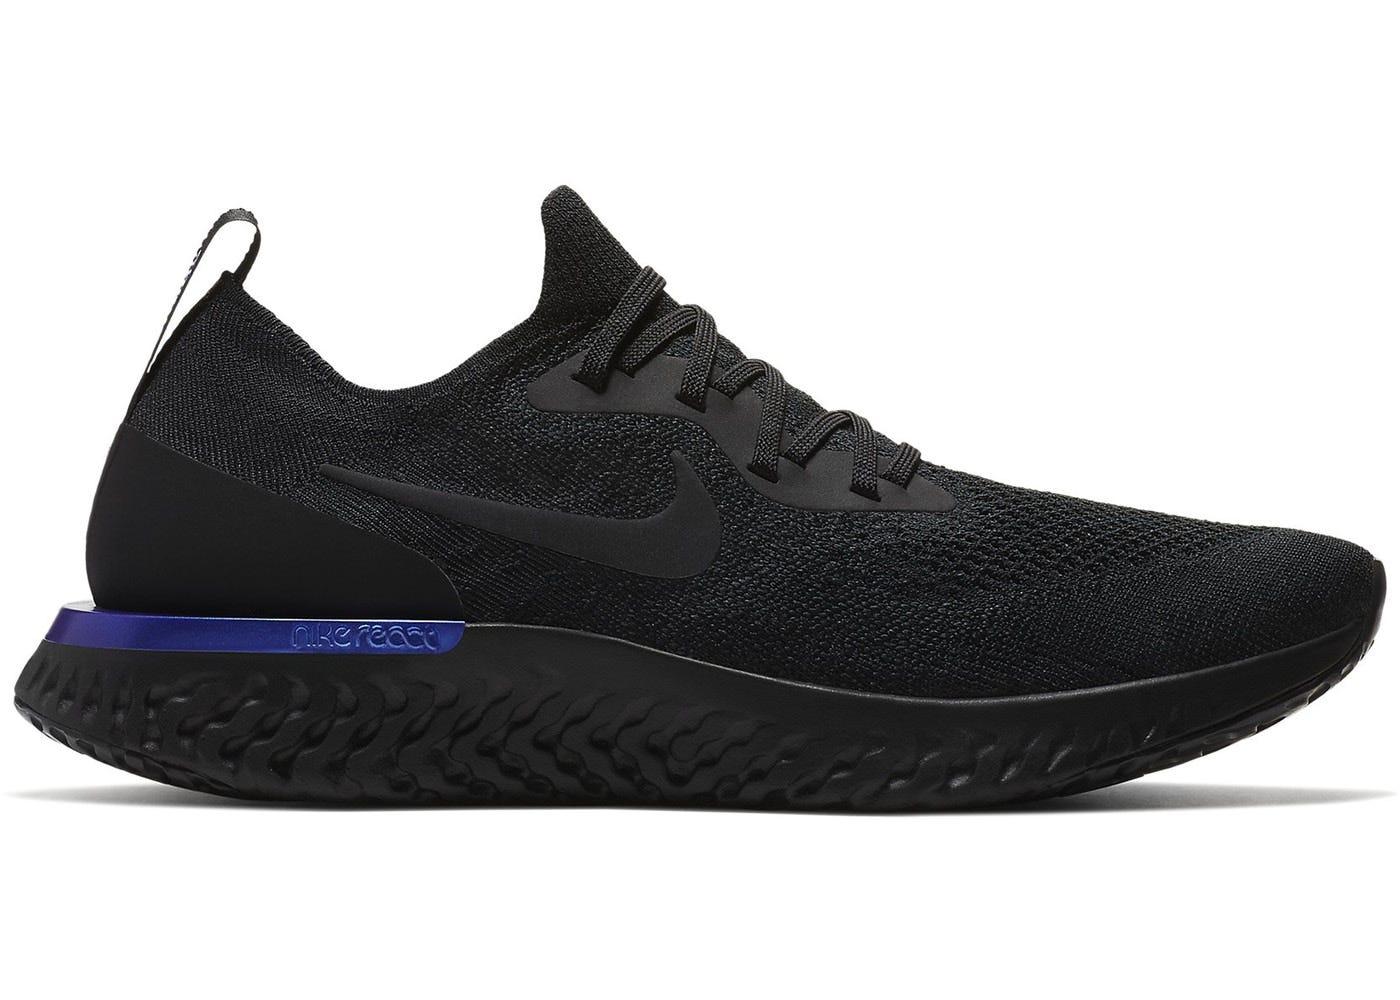 brand new 12dbf 4cf60 Best Running Shoes For Women